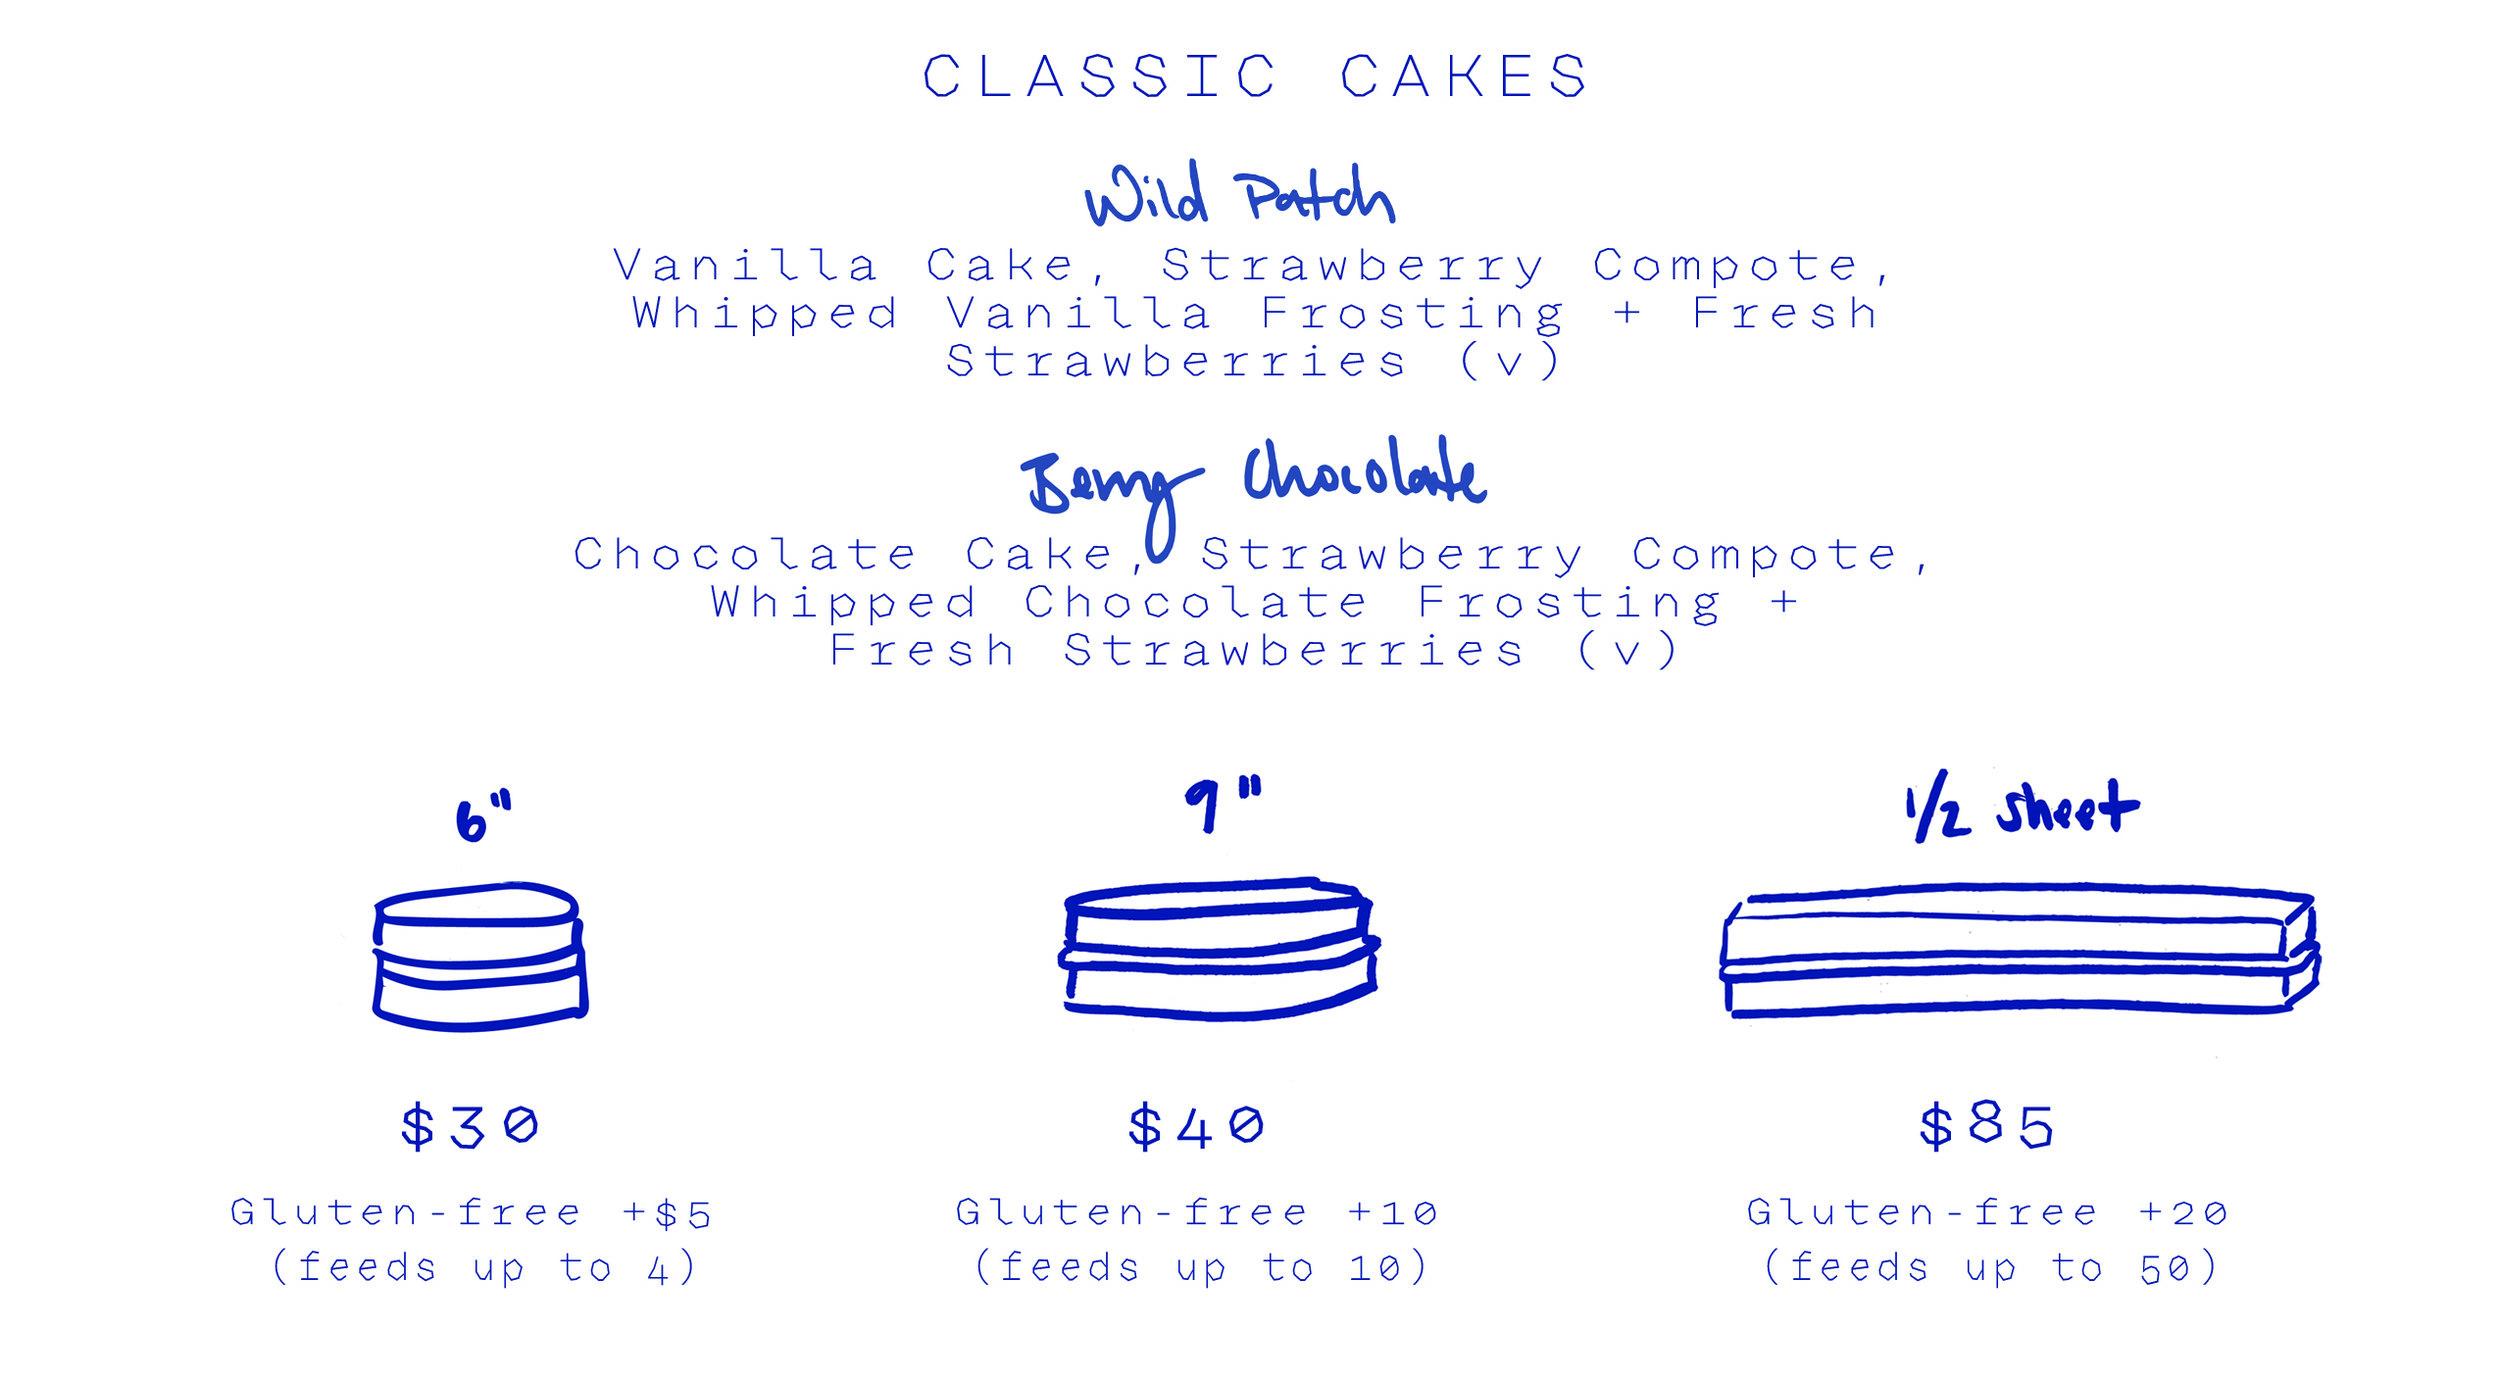 cake menu_classic.jpg